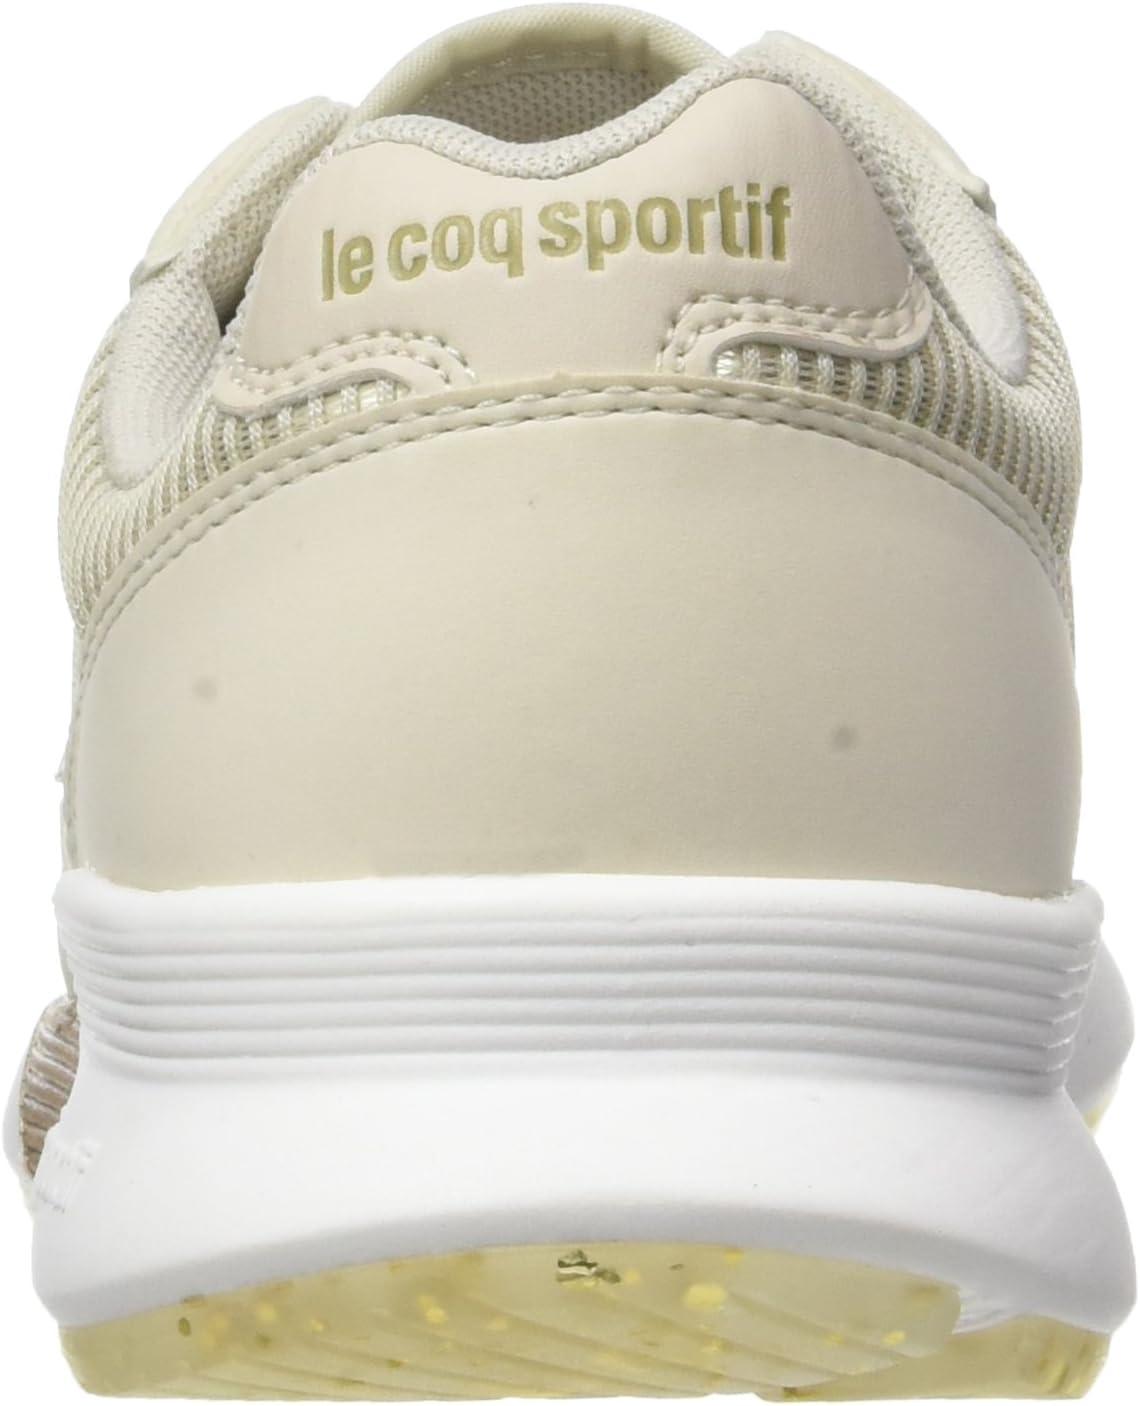 le coq Sportif Omega X W Striped Sock Sparkly Trainer Low, zwart Beige Turtle Gris Dove